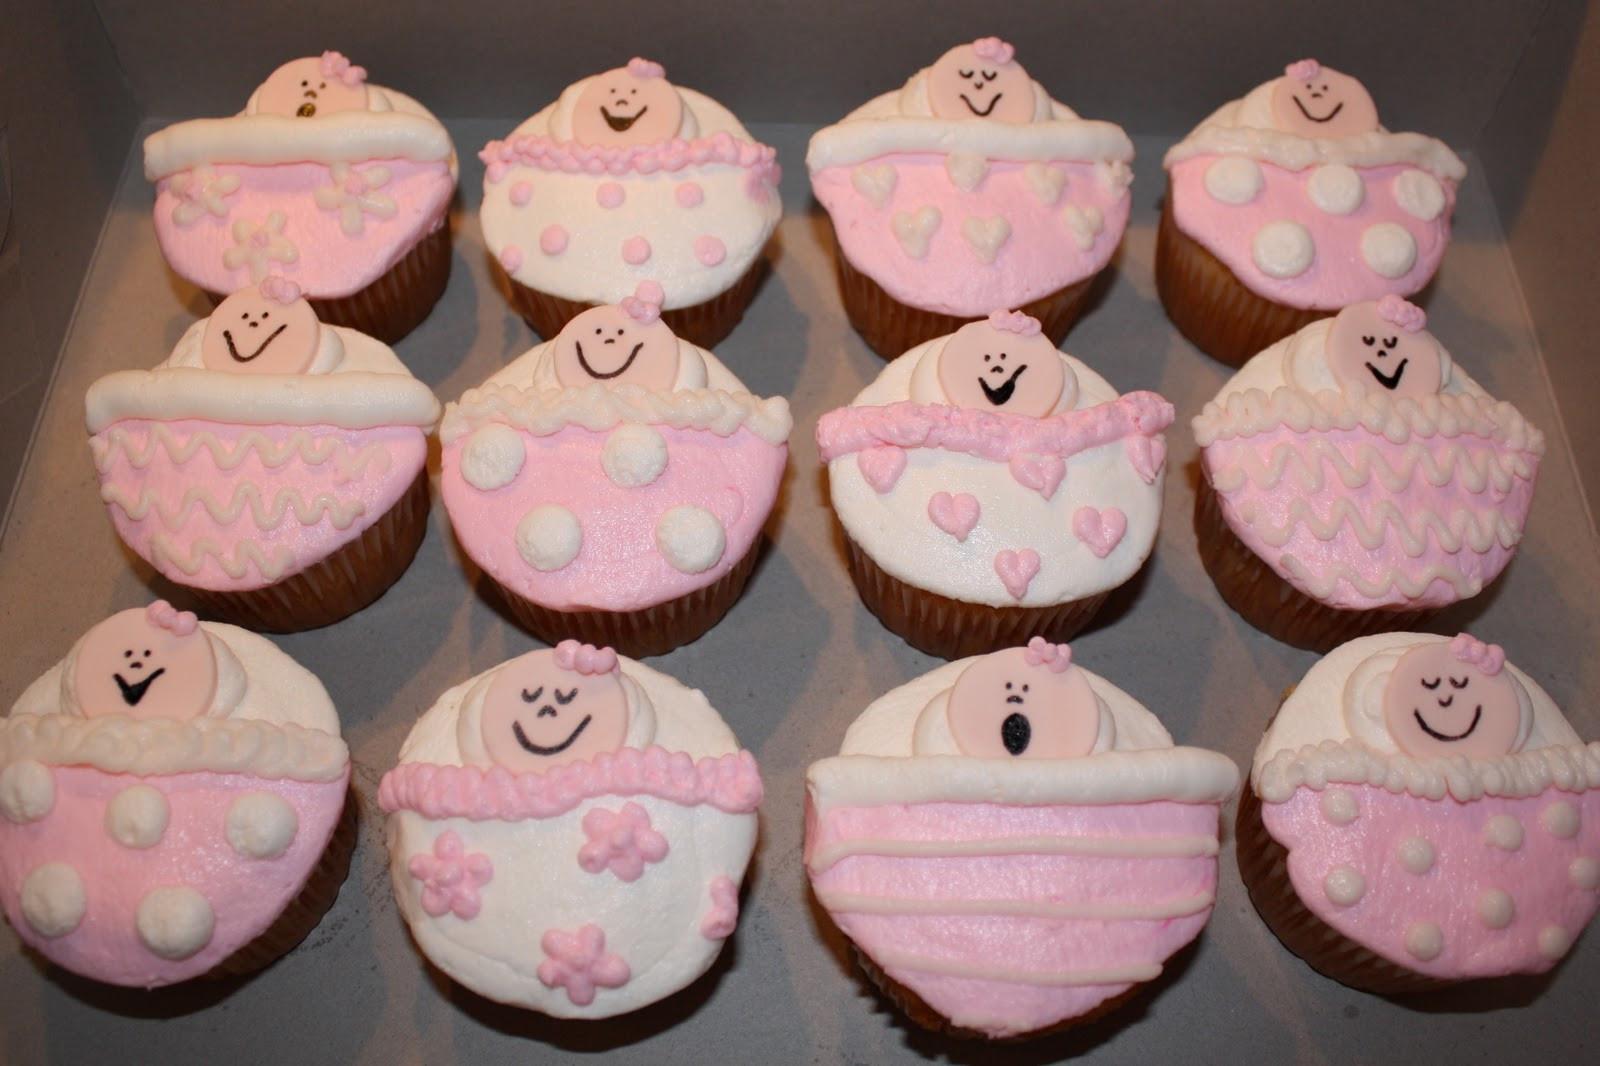 Baby Shower Cupcakes For Girls  Kake Baby Girl Shower Cupcakes